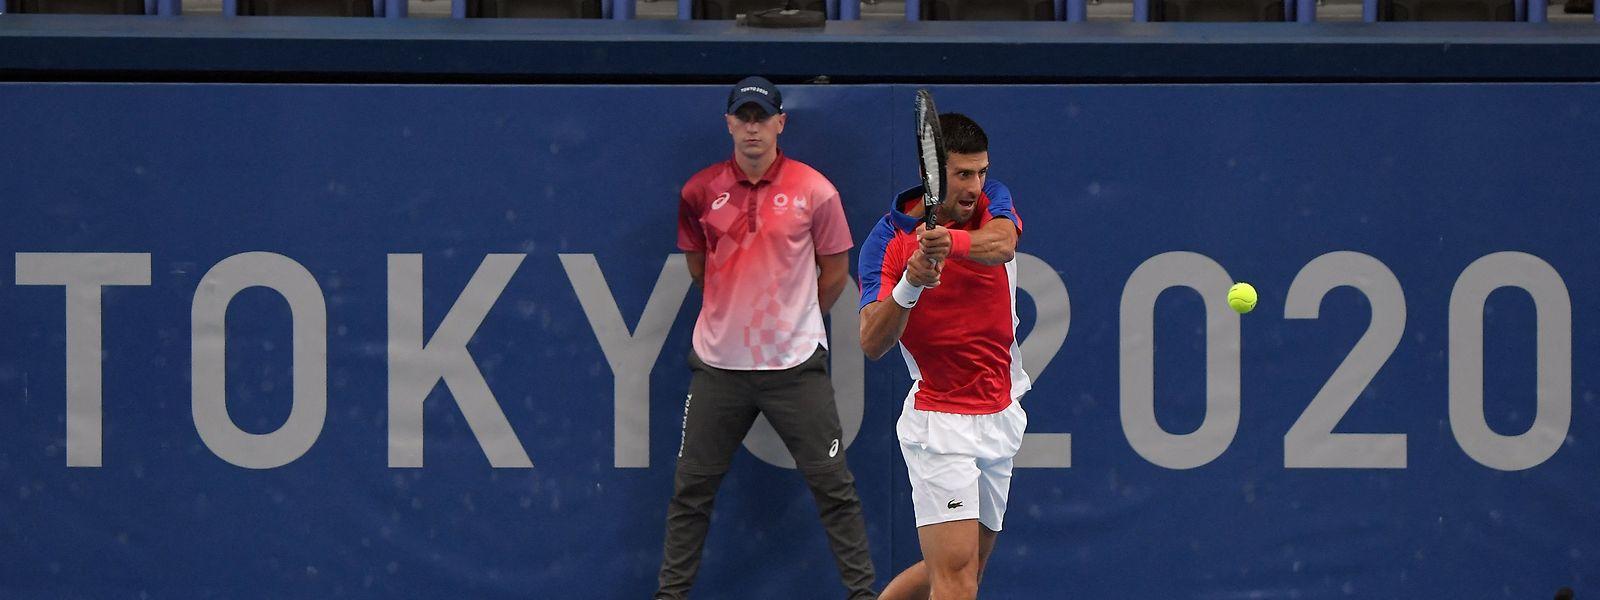 Novak Djokovic muss die Heimreise antreten.